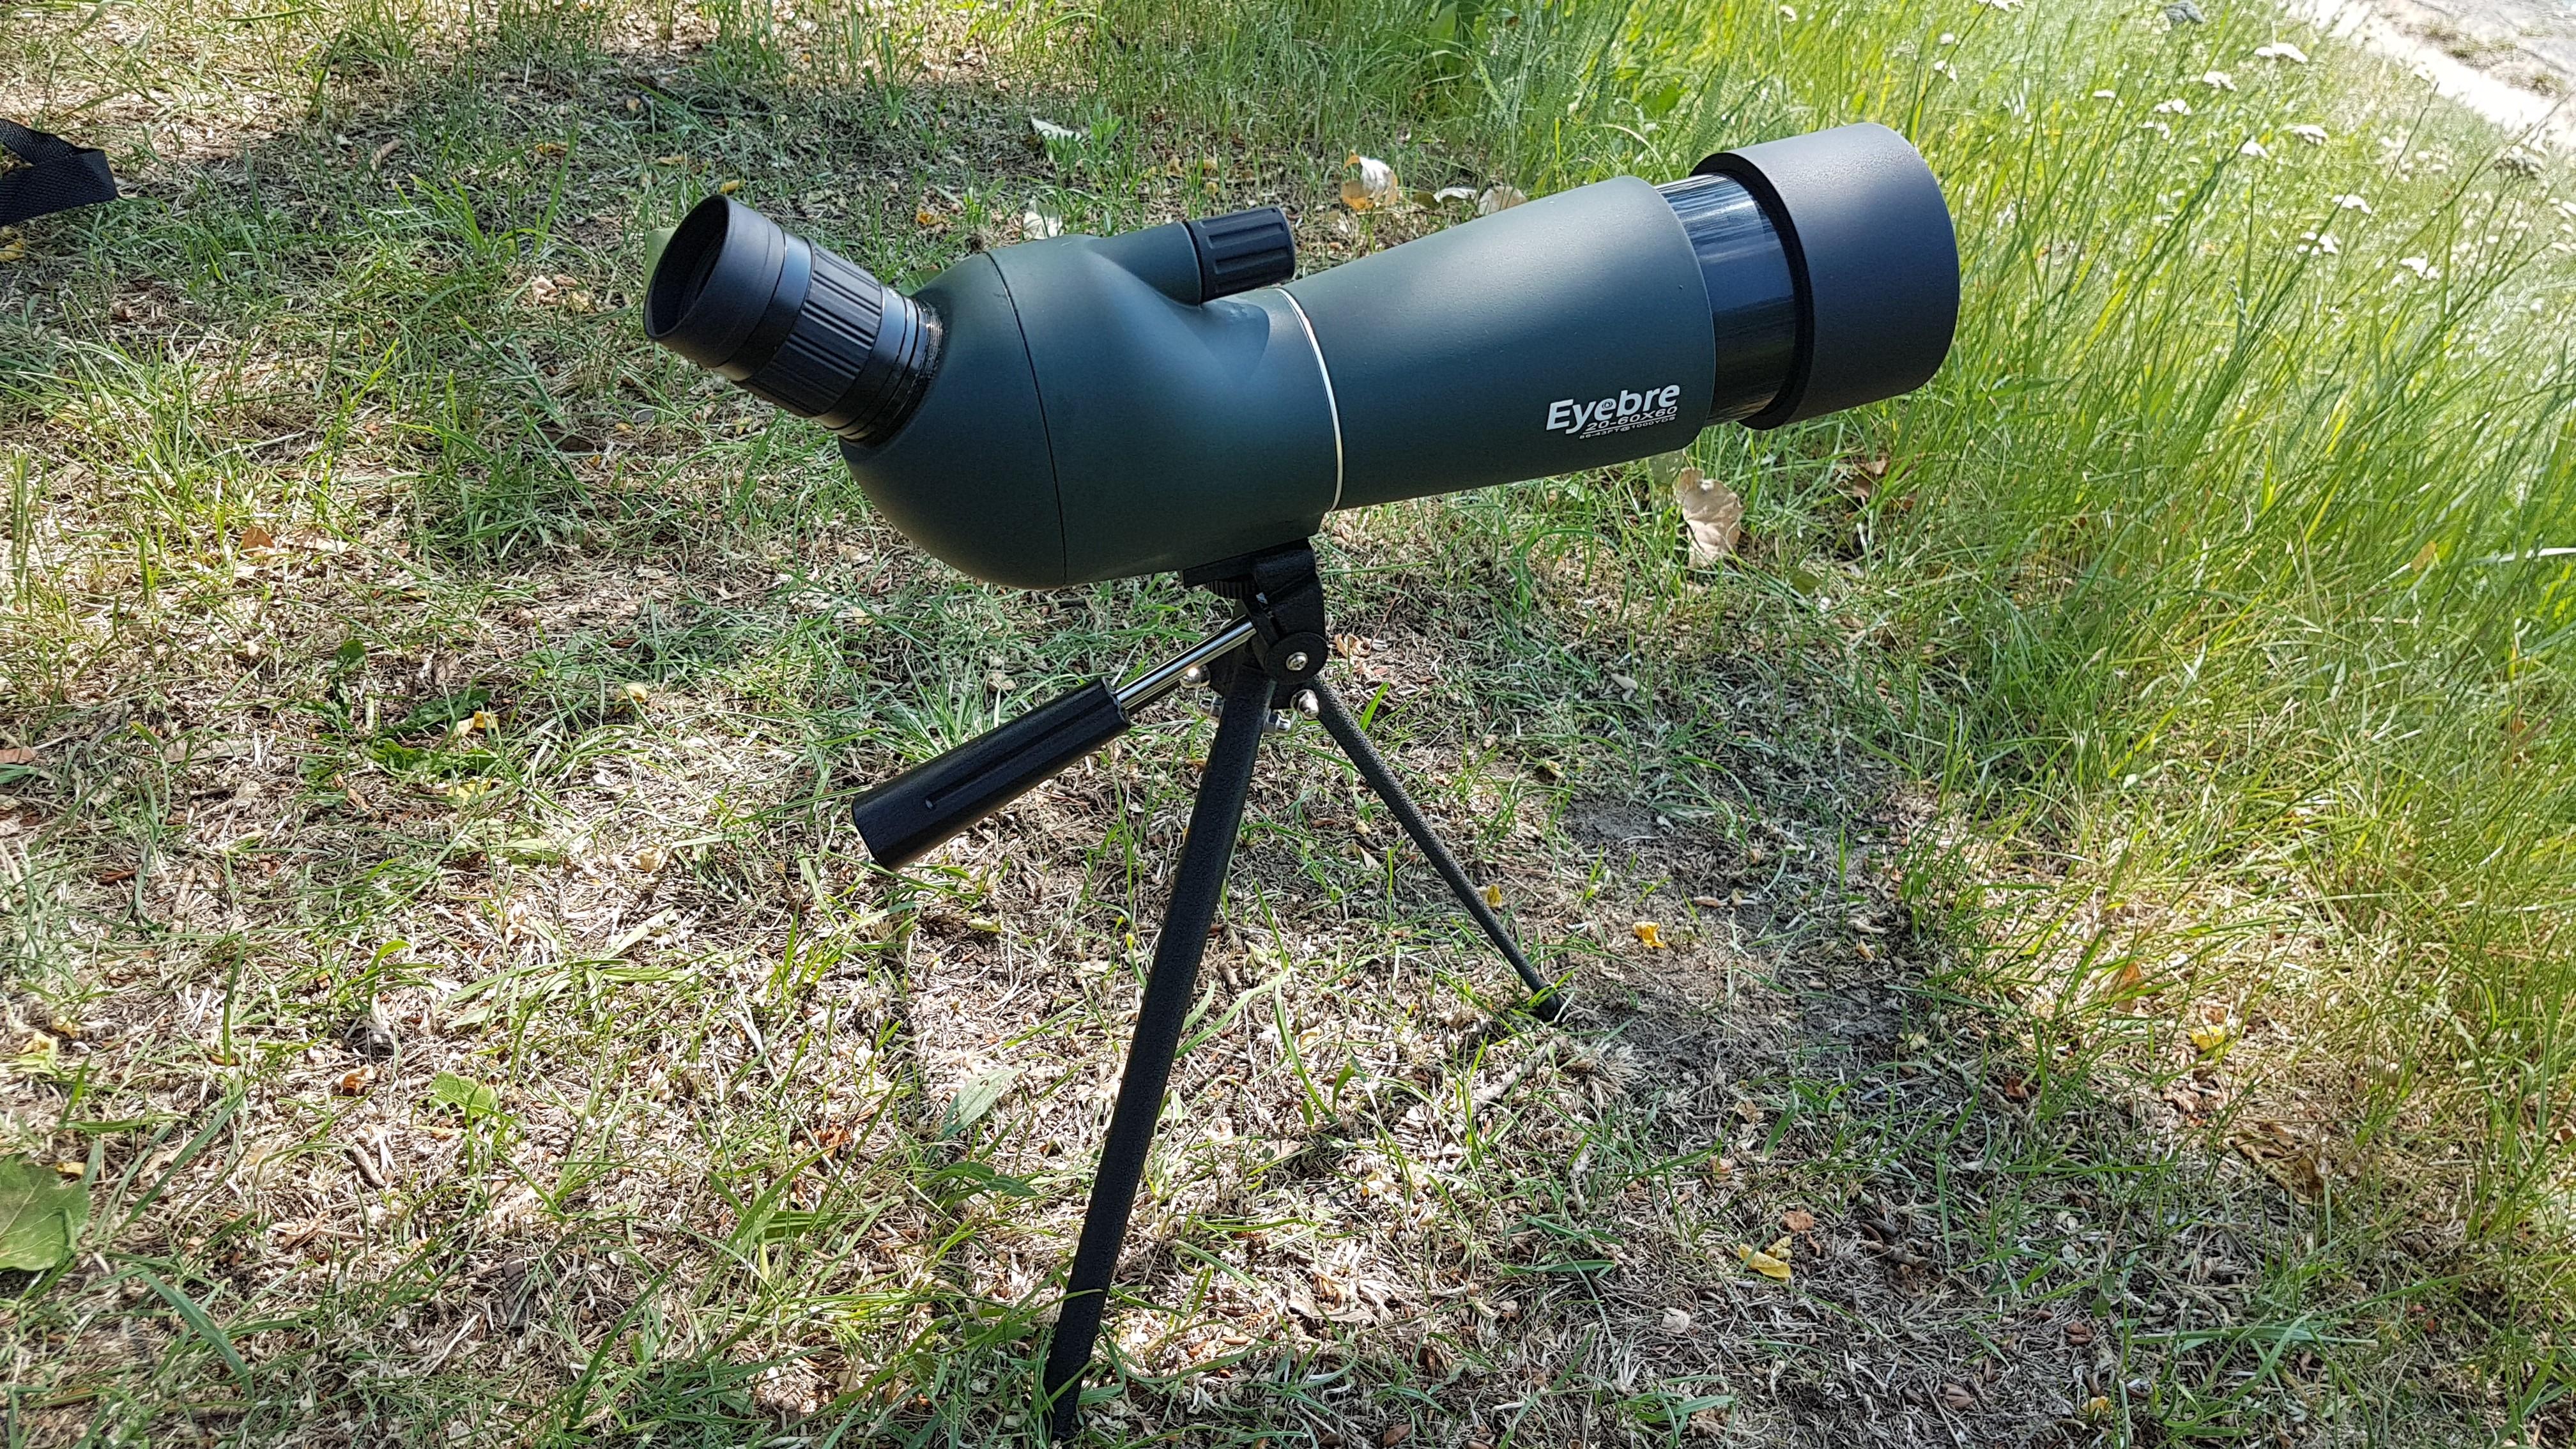 tavcso-eyebre-20-60x60-tavcso-spektiv-latcso-monocular-megfigyelo-vadasz-loter-madar-figyelo-termeszet-kirandulas-spective-allvany-01.JPG